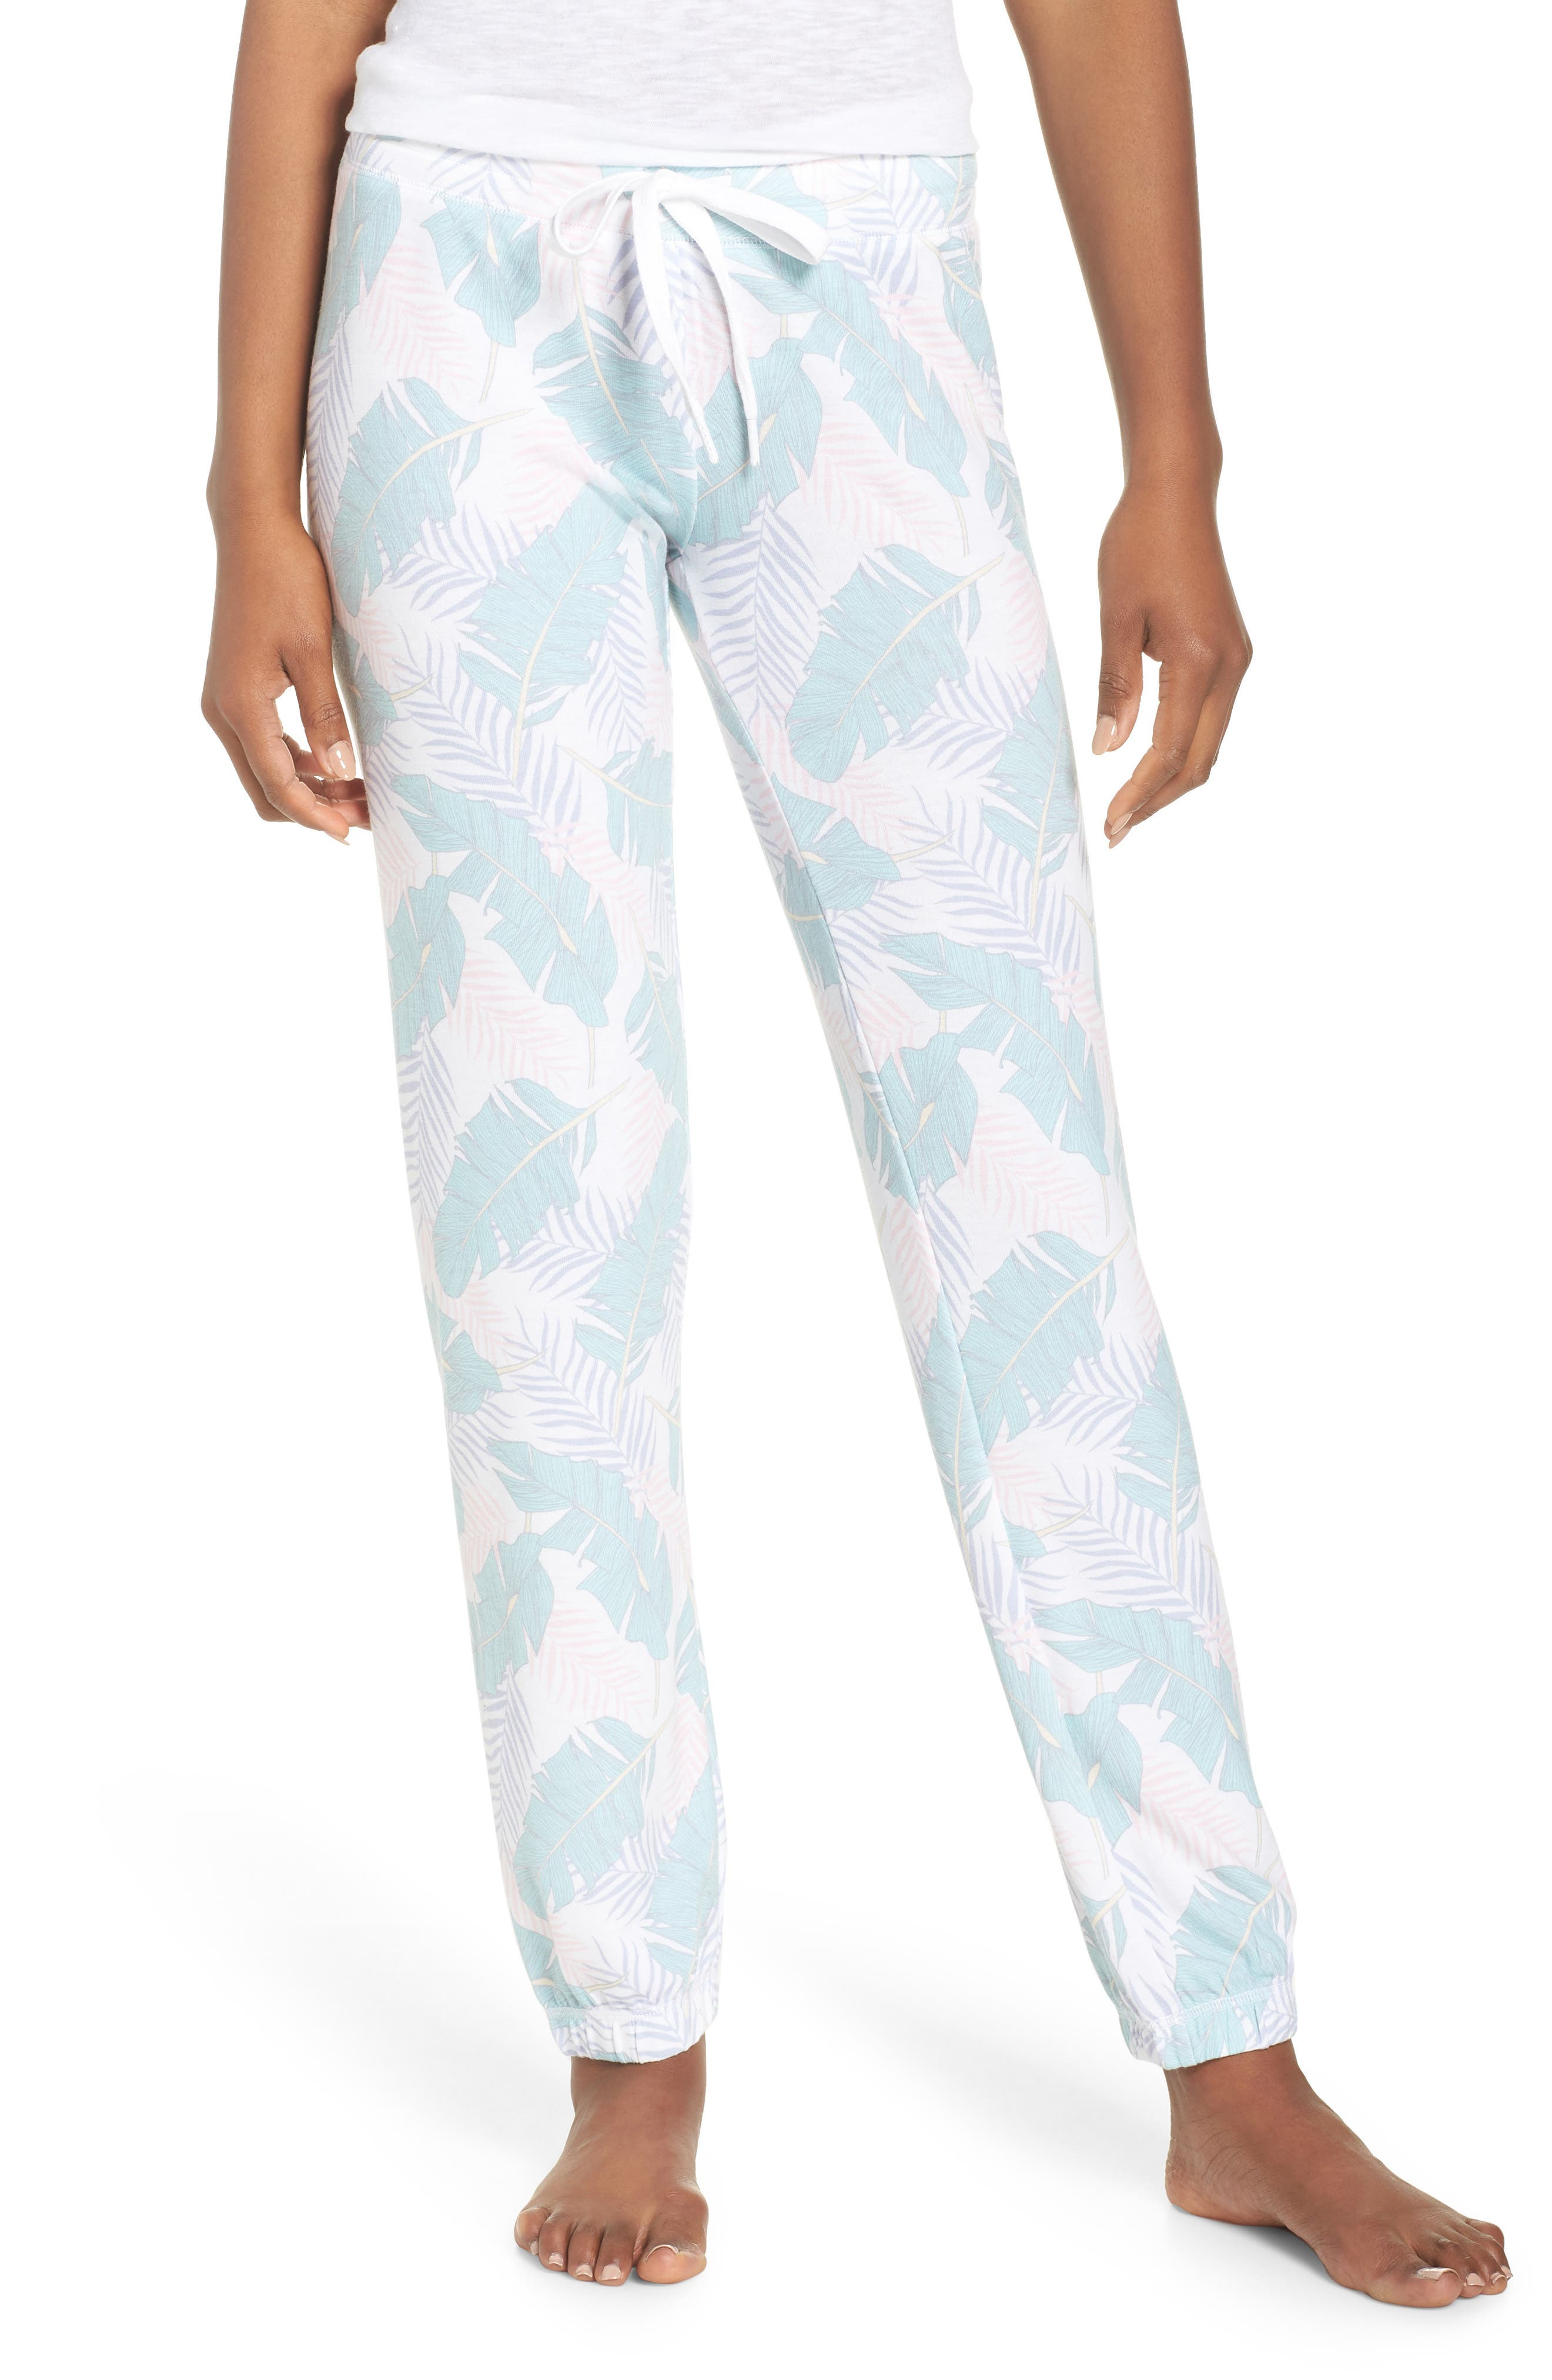 Peachy Jogger Lounge Pants,                             Main thumbnail 1, color,                             100